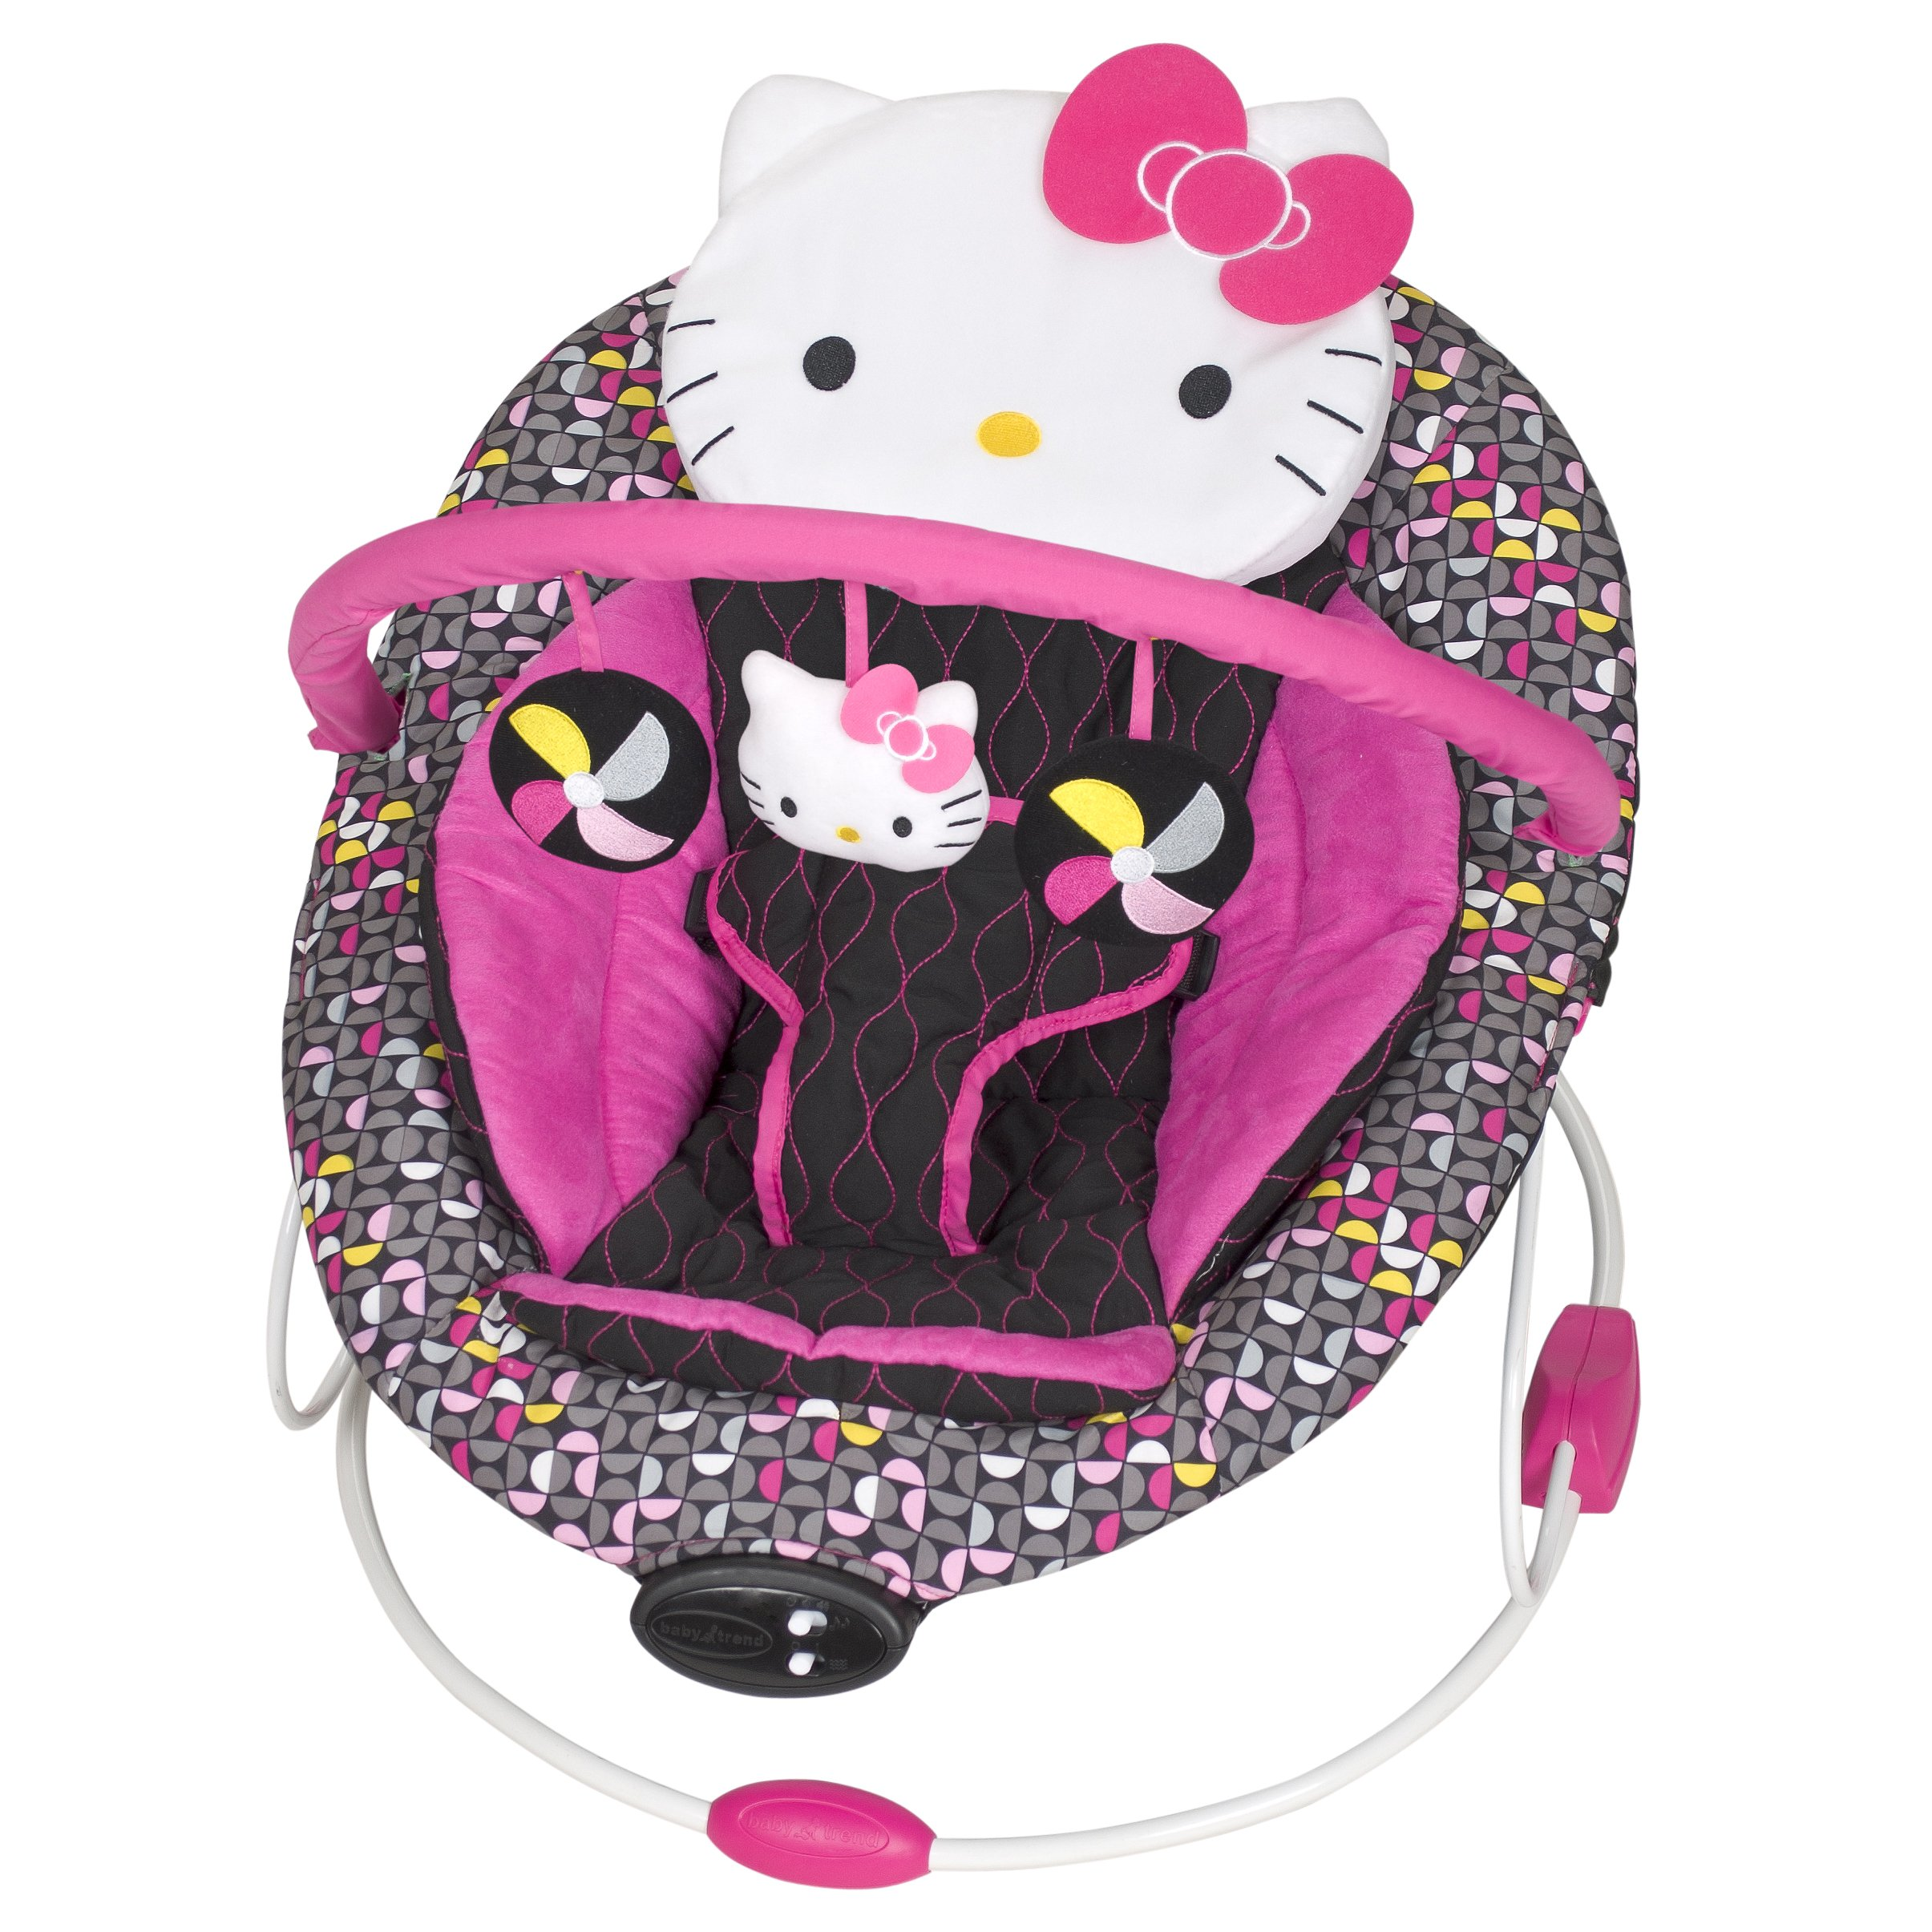 Baby Trend Hello Kitty Bouncer Pinwheel